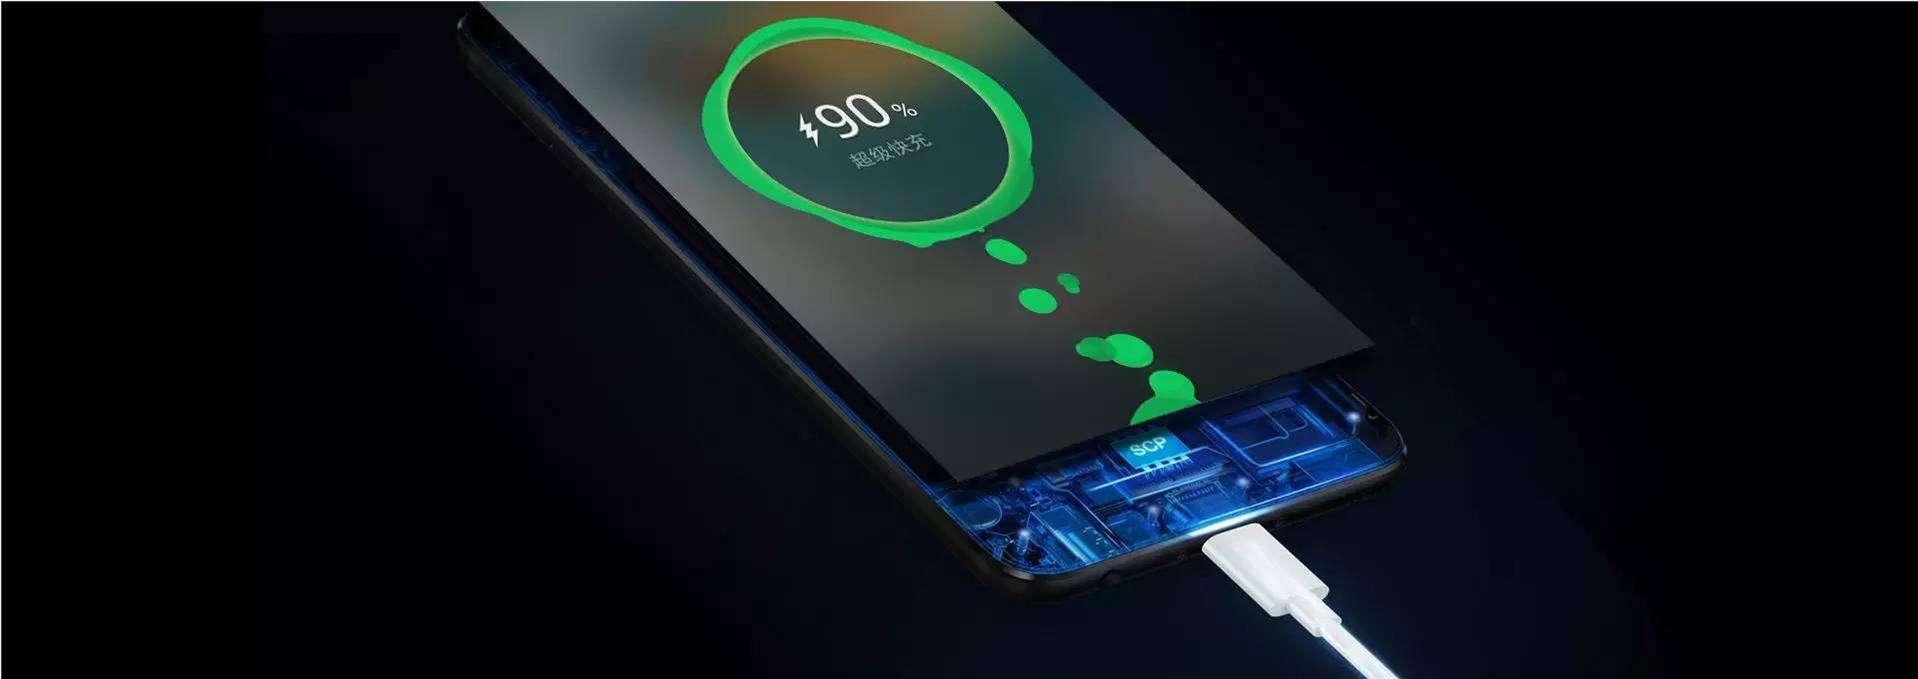 iPhone XR还在用5W祖传充电?华为Mate20安全快充续航更强劲